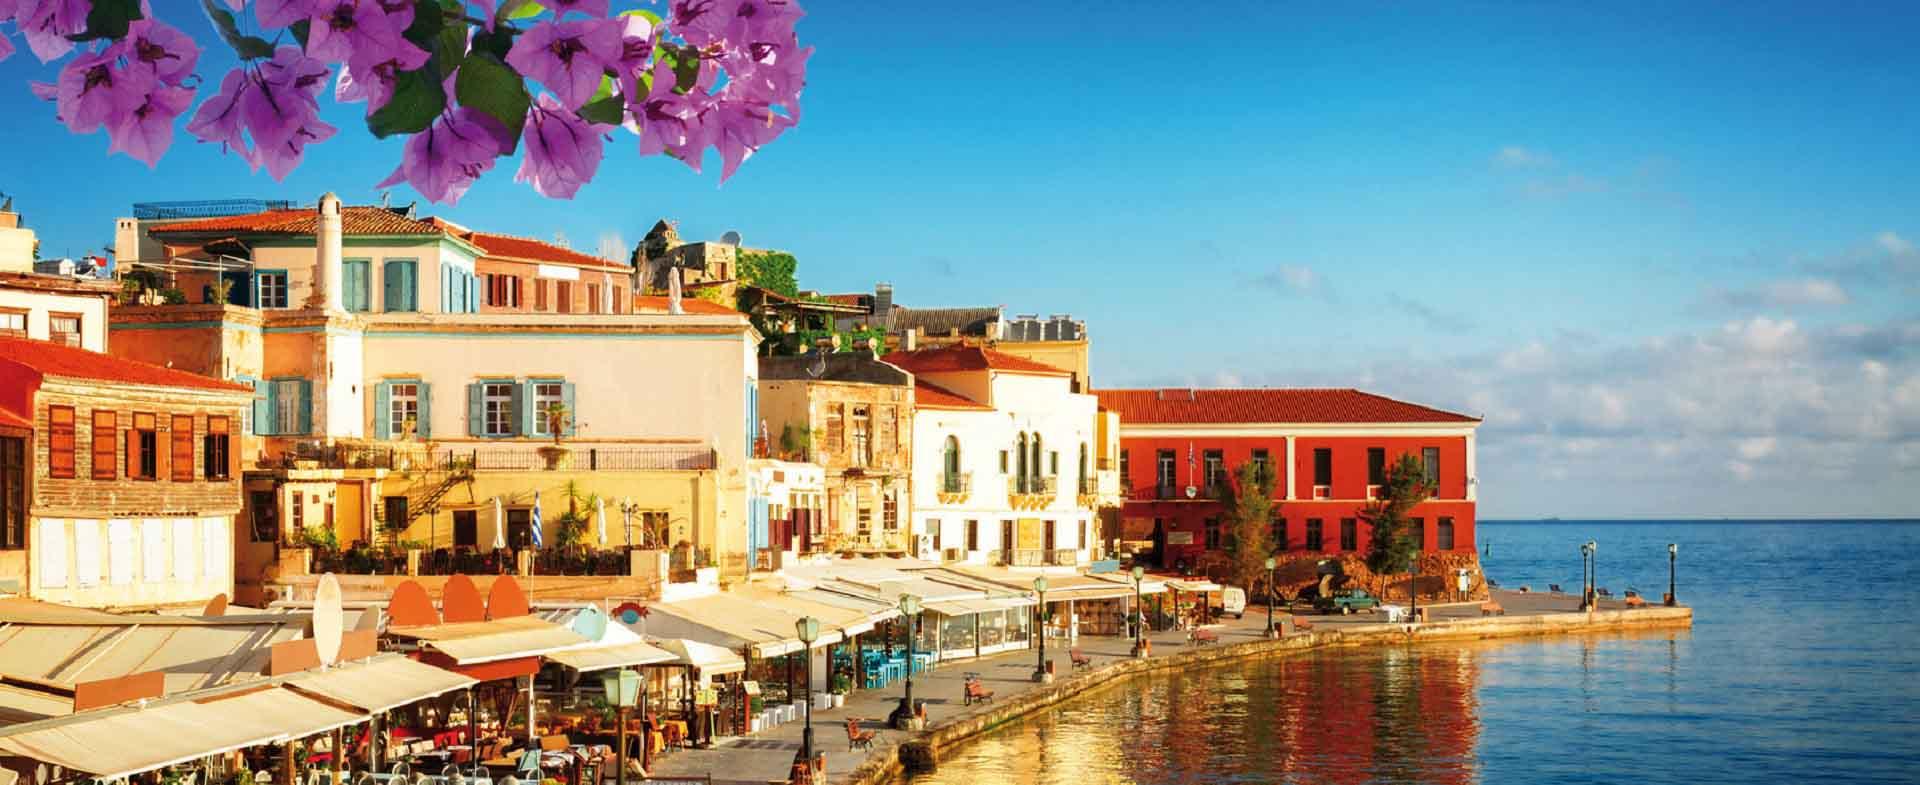 petit port de mediterranee